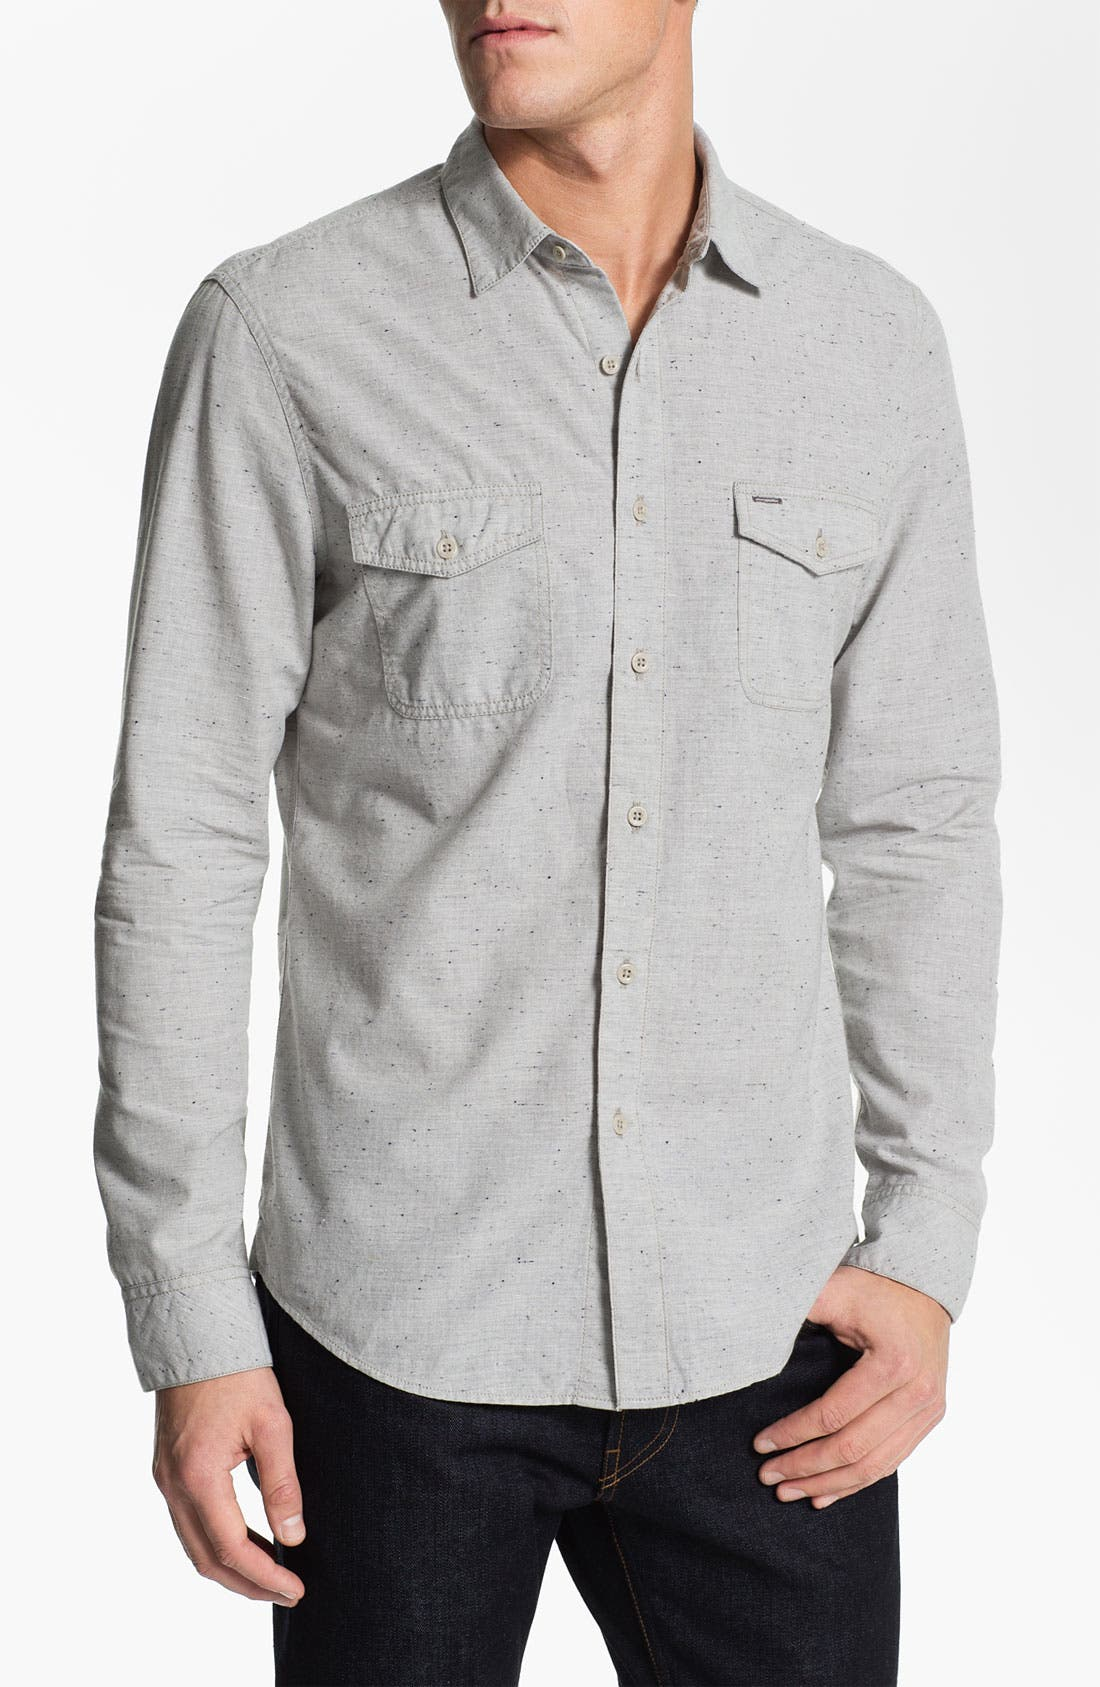 Main Image - 1901 Nep Cotton Woven Shirt